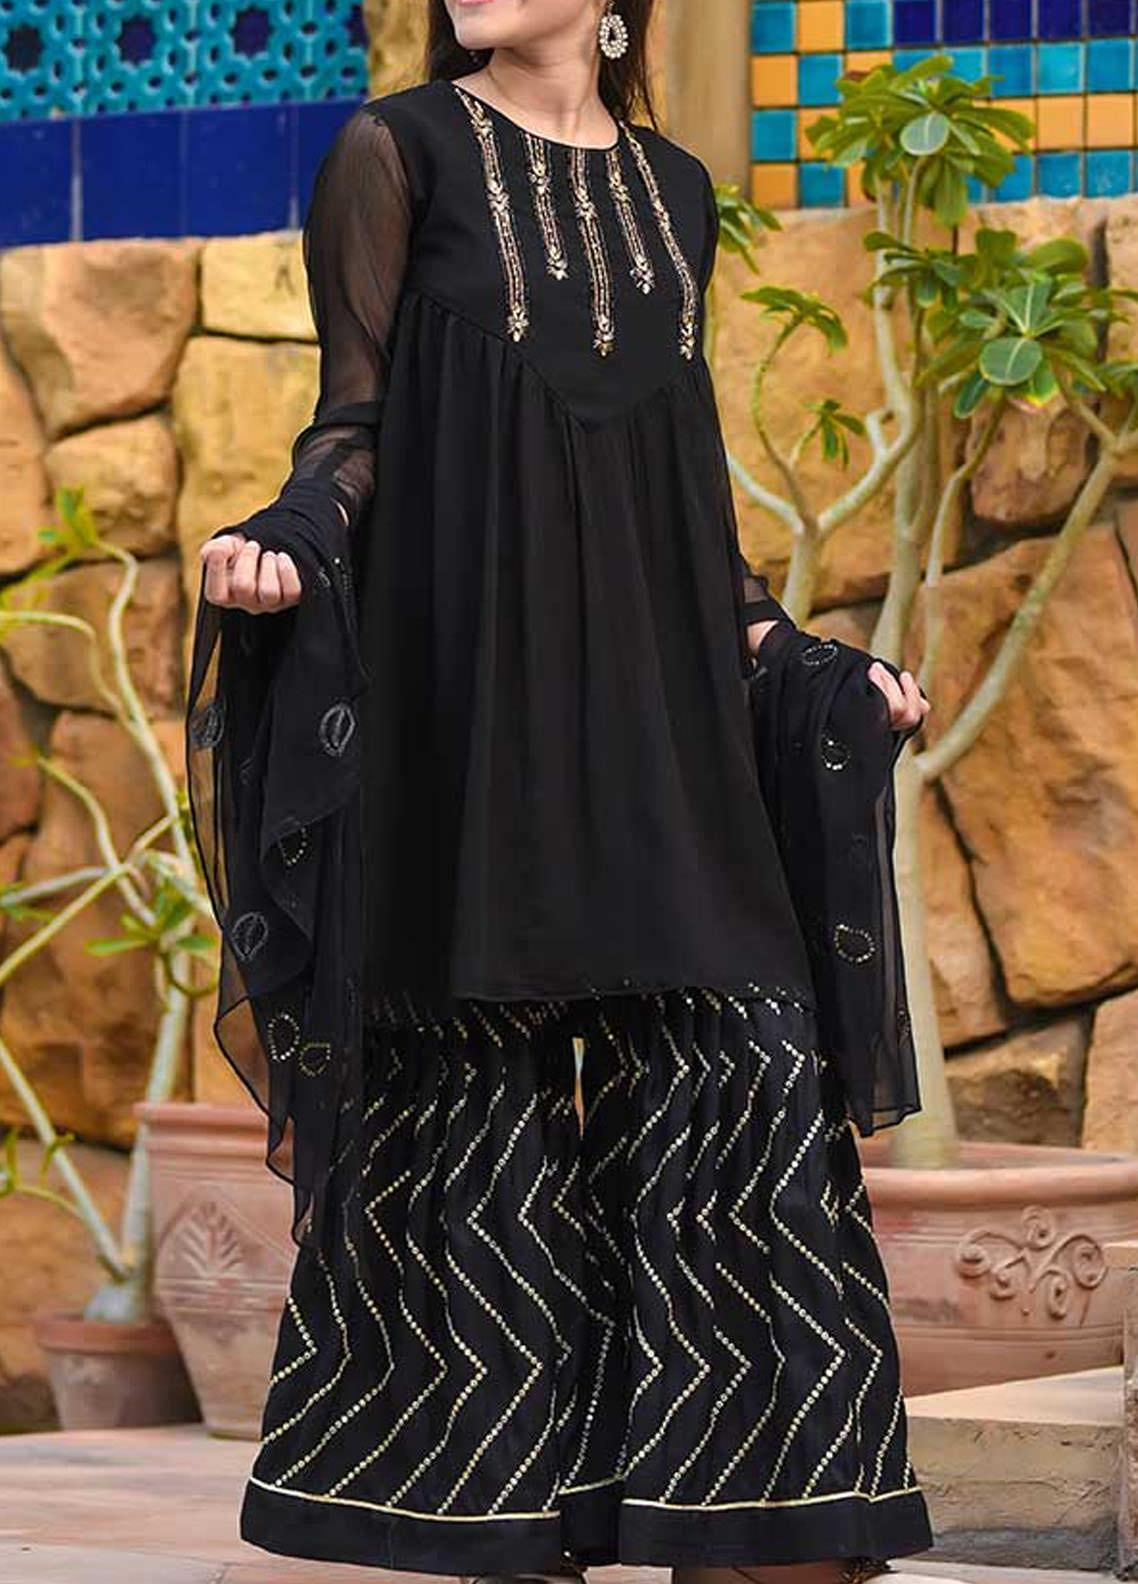 Ochre Chiffon Fancy 3 Piece Suit for Girls - OFW 287 Black